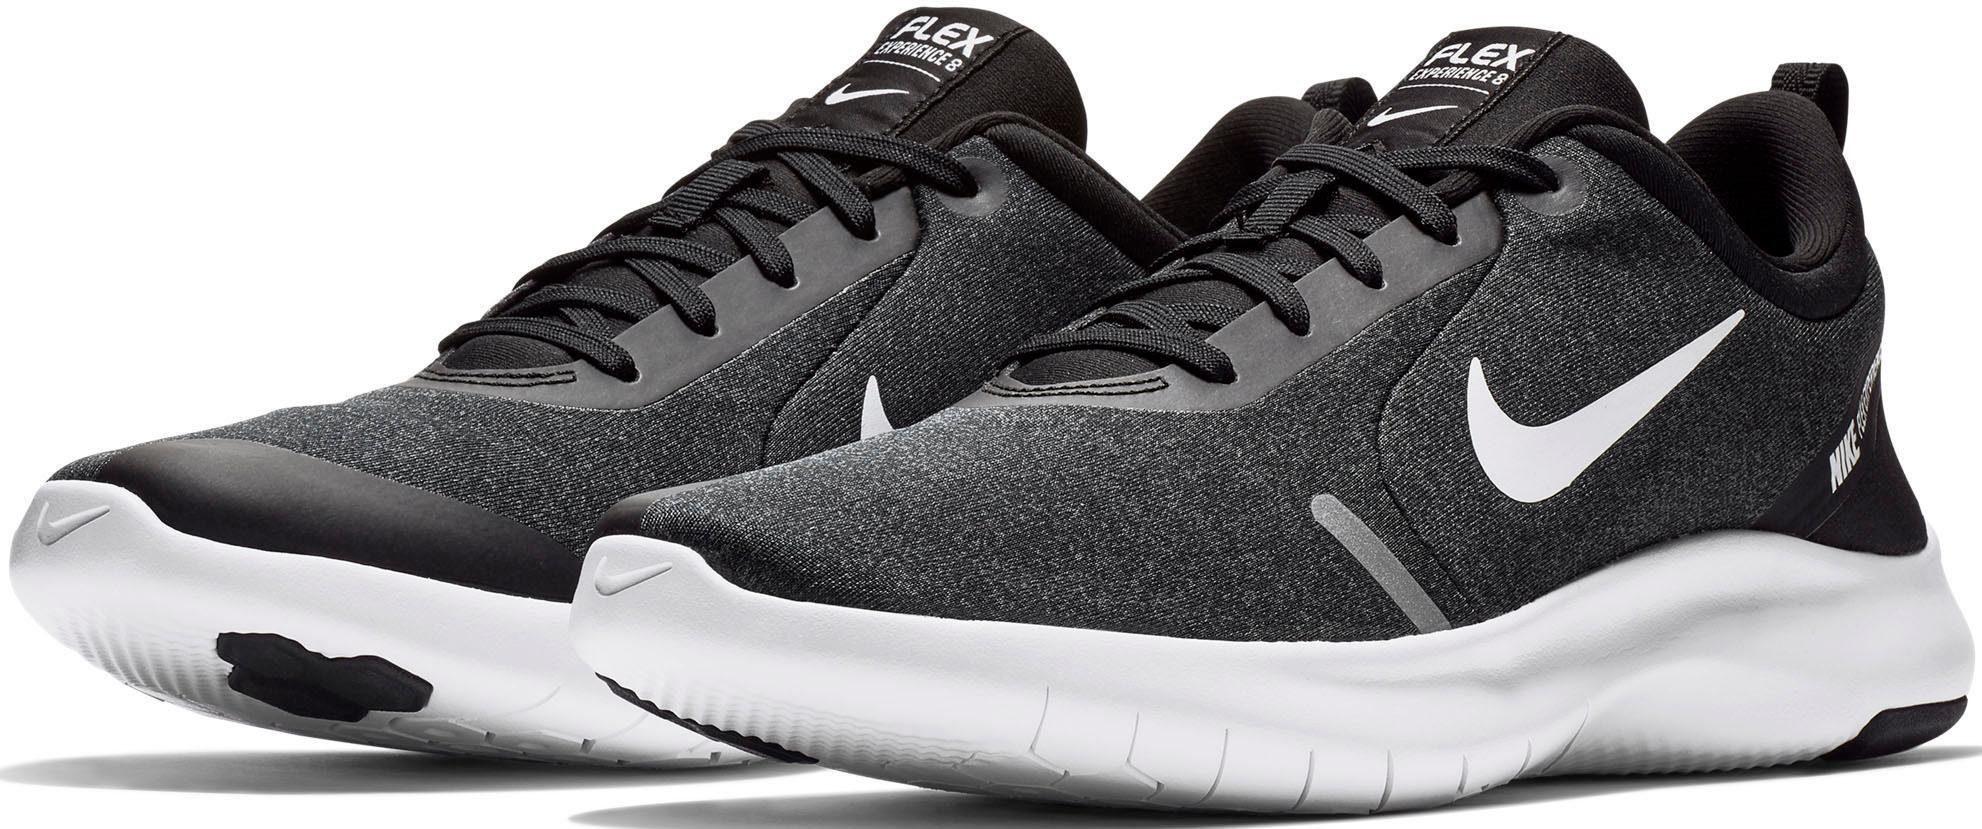 Nike »Flex Experience Run 8« Laufschuh kaufen | OTTO